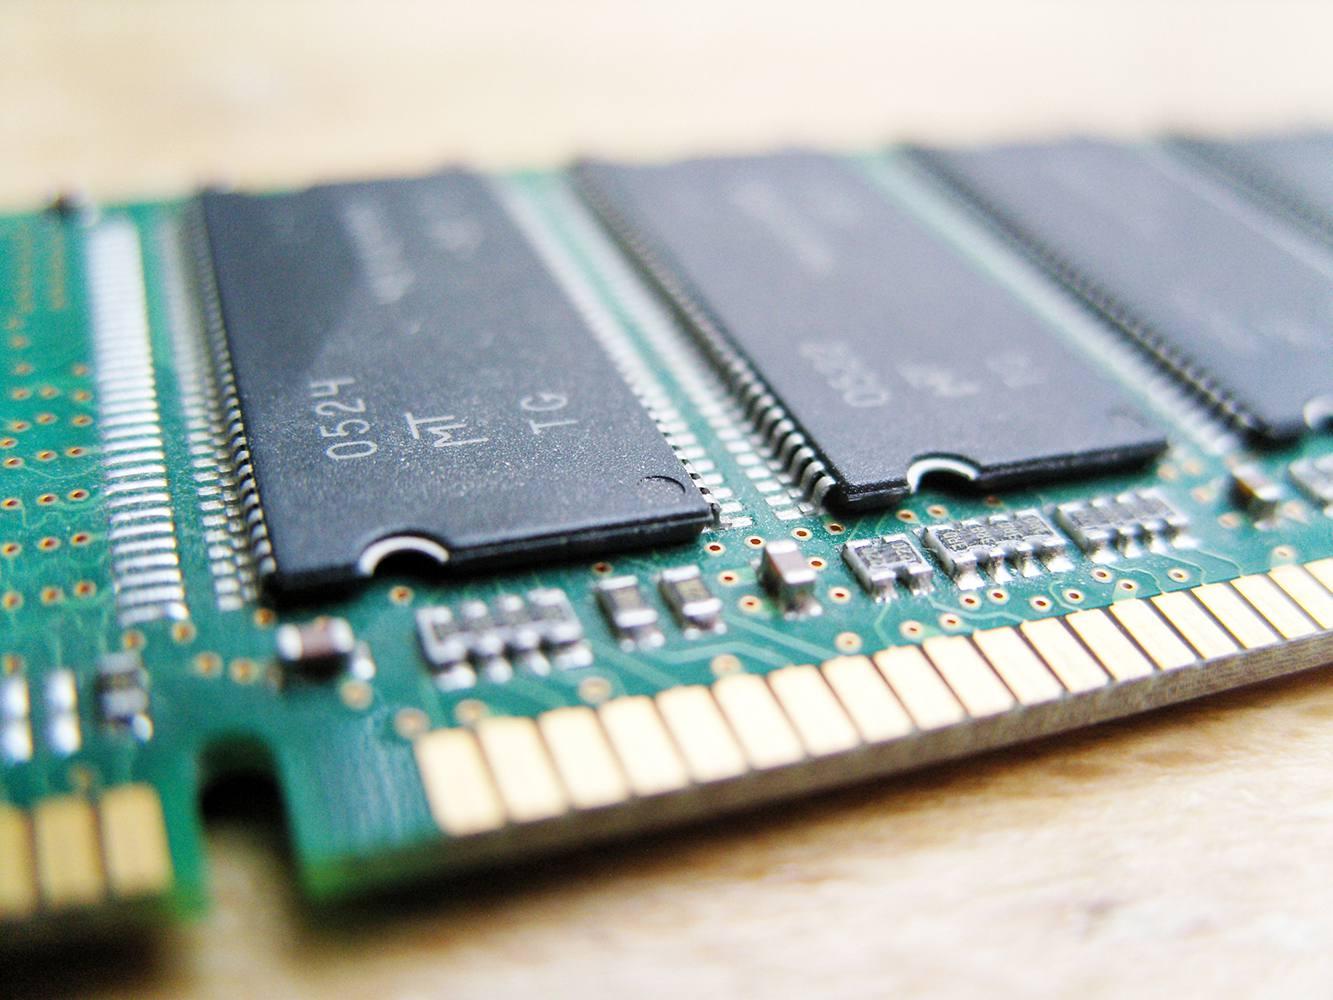 RAM circuit board assembly